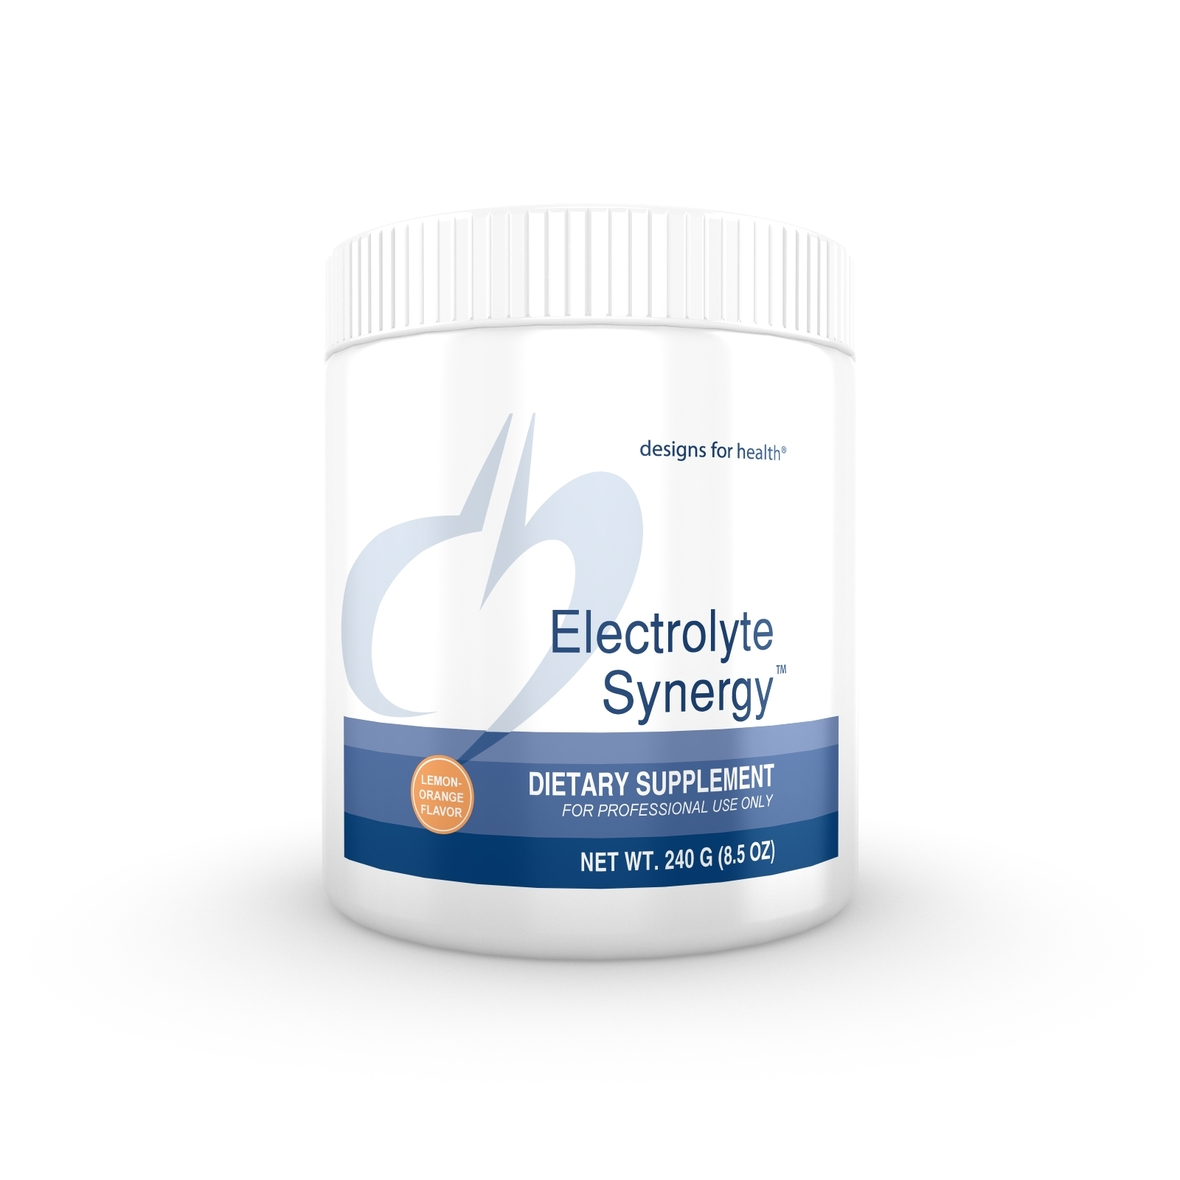 Electrolyte-Synergy-240g 1